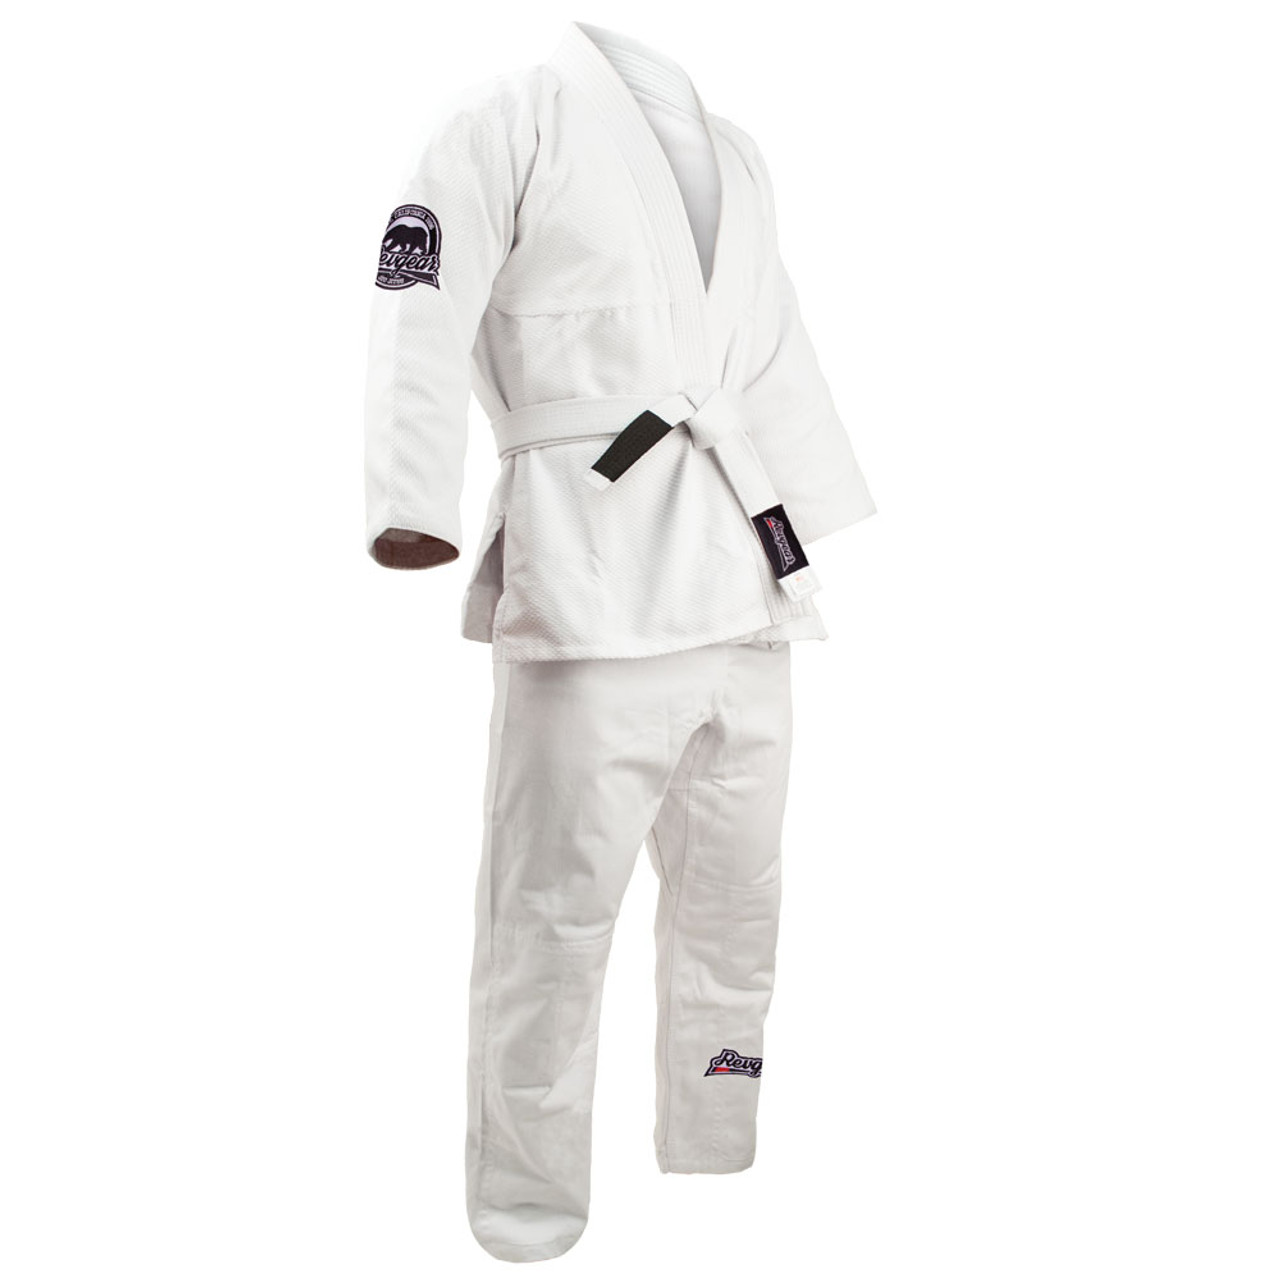 The Ultimate Starter Jiu Jitsu Gi - White